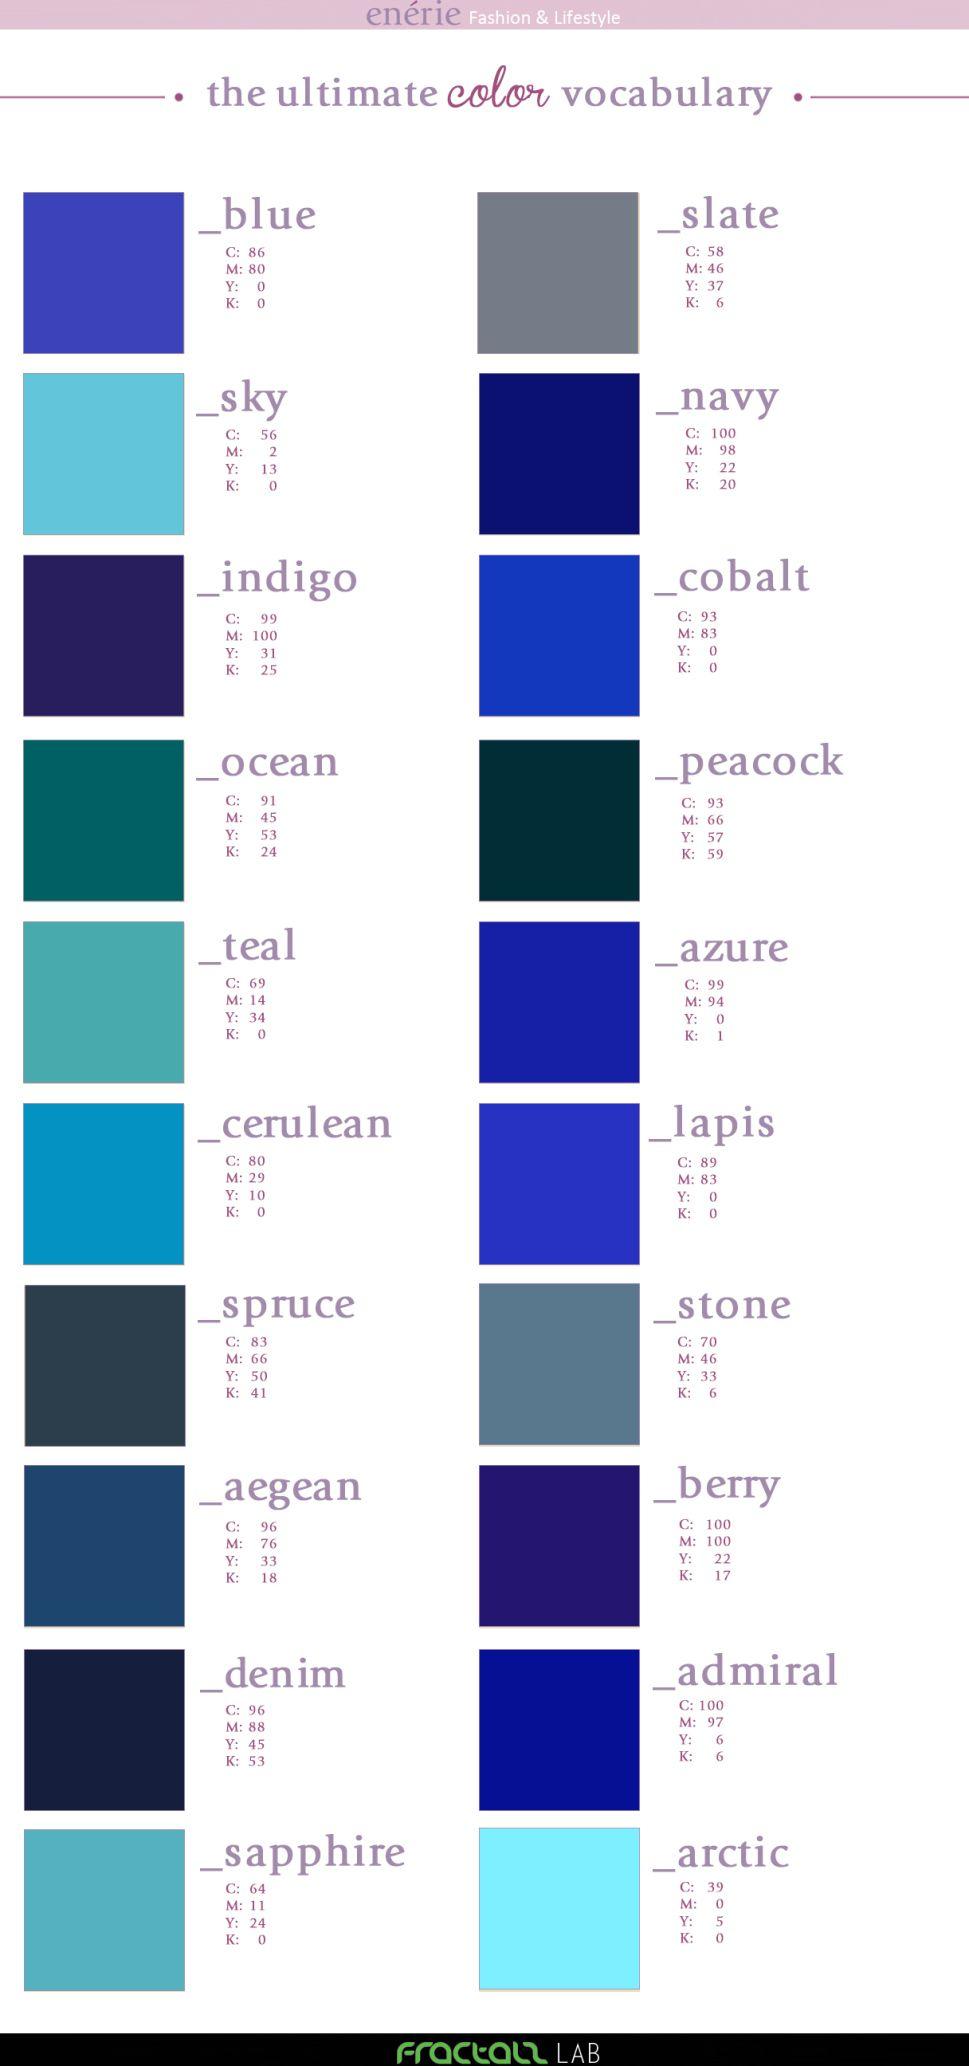 Fashion Vocabulary Colorpart8 Ivaizdis Pinterest Fashion